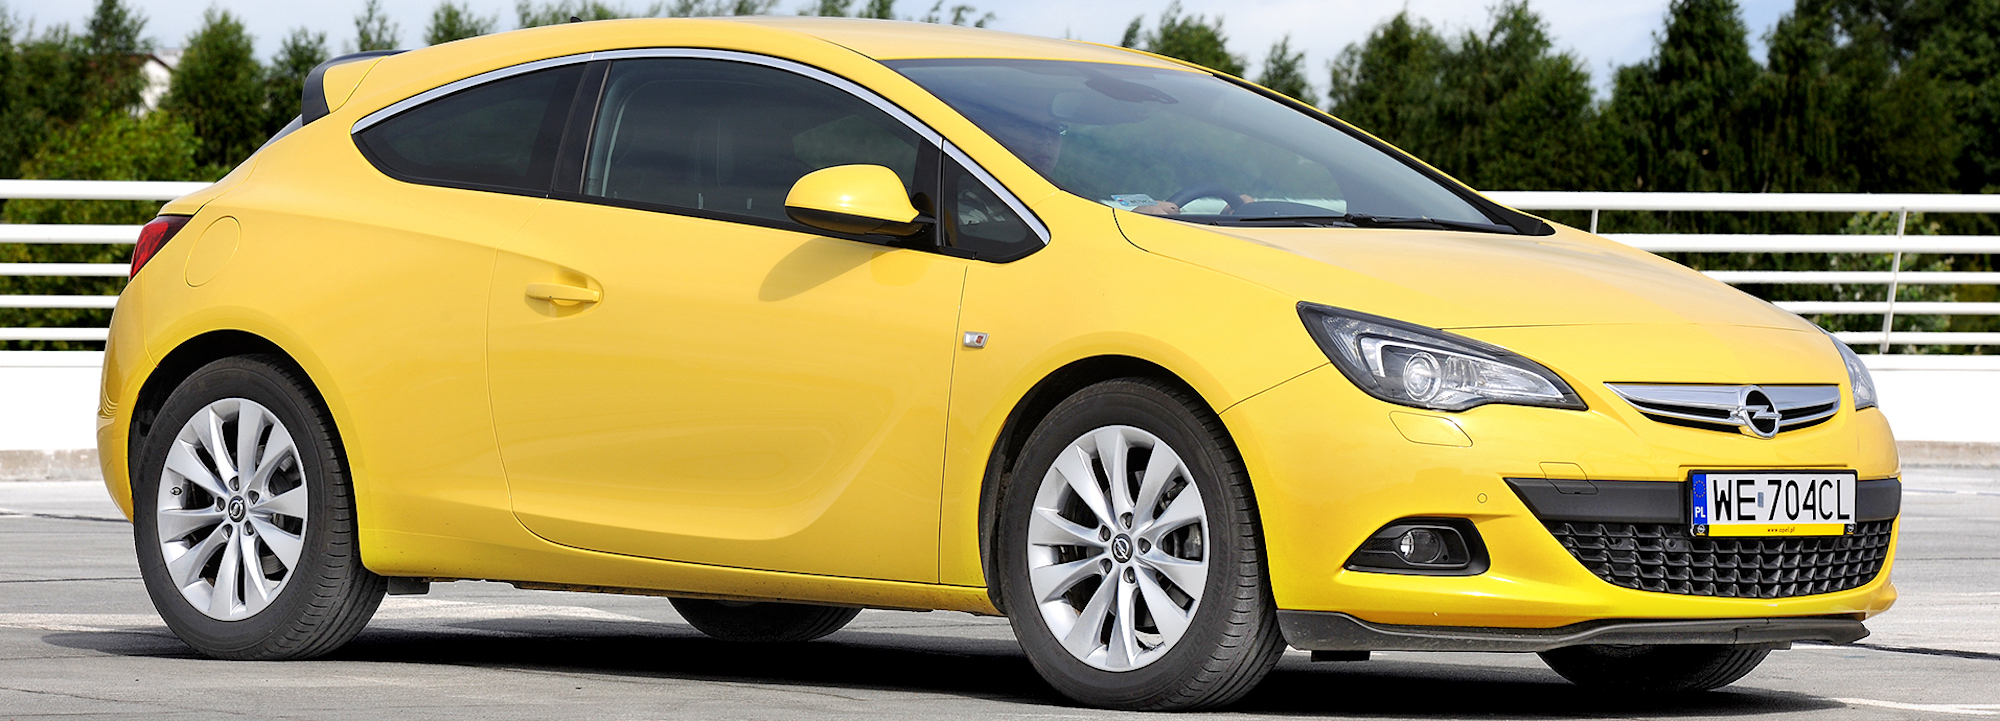 Opel Astra J (2009-2018)